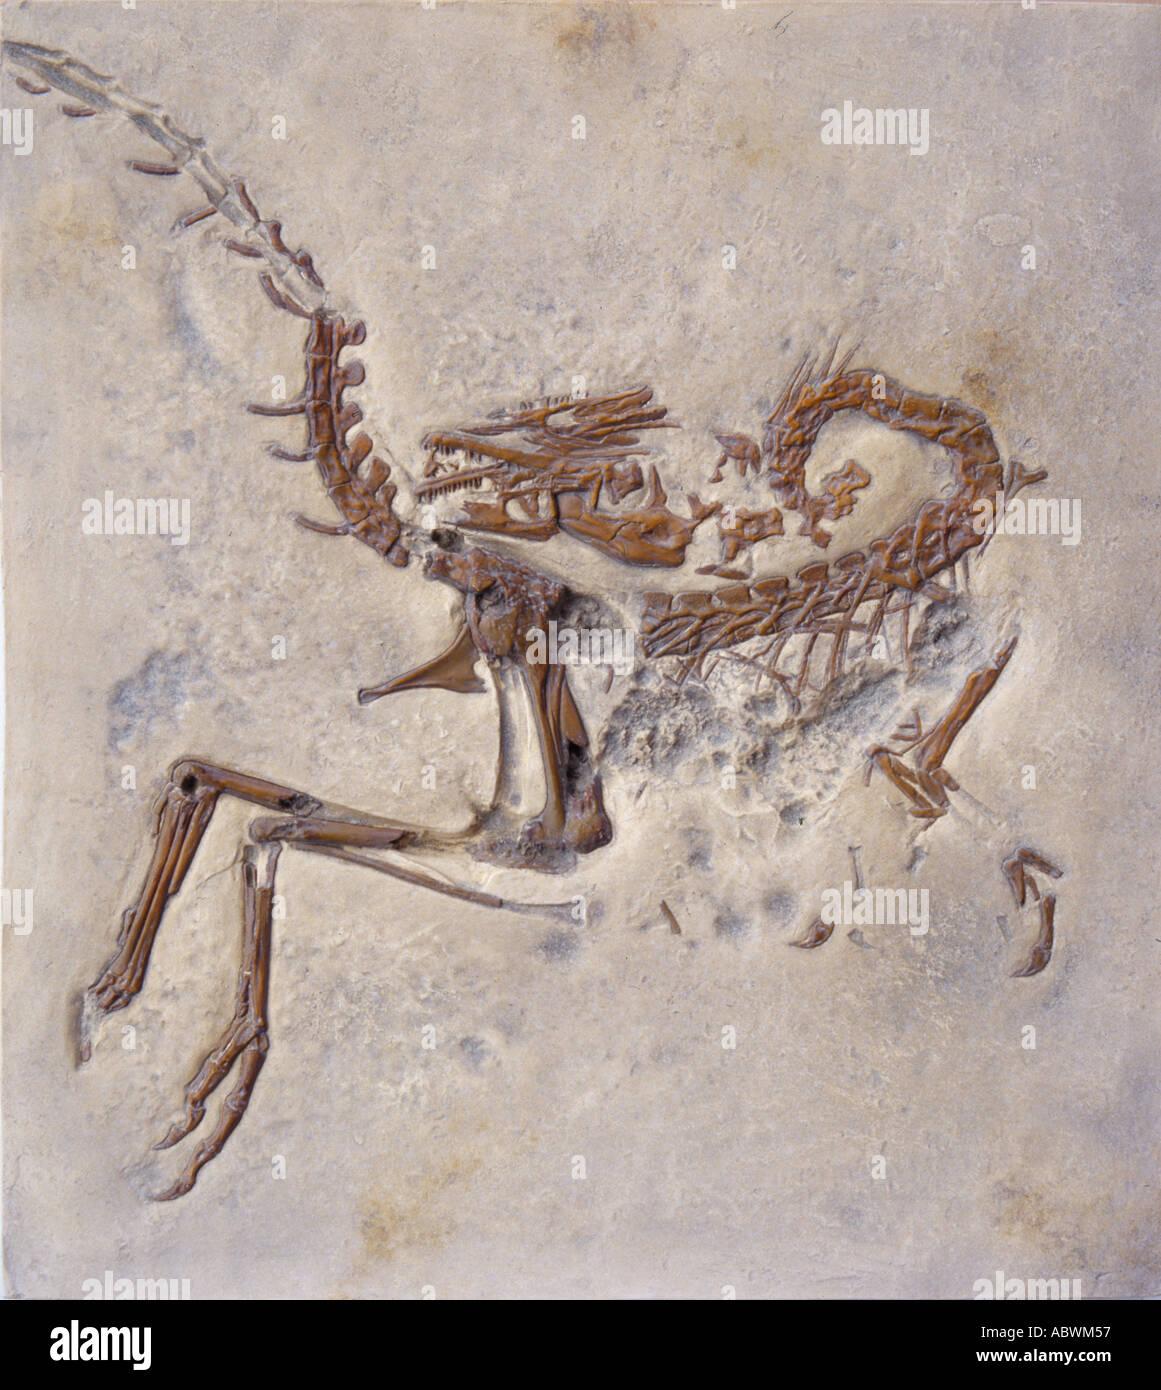 Compsognathus longipes dinosaure Jurassique Photo Stock